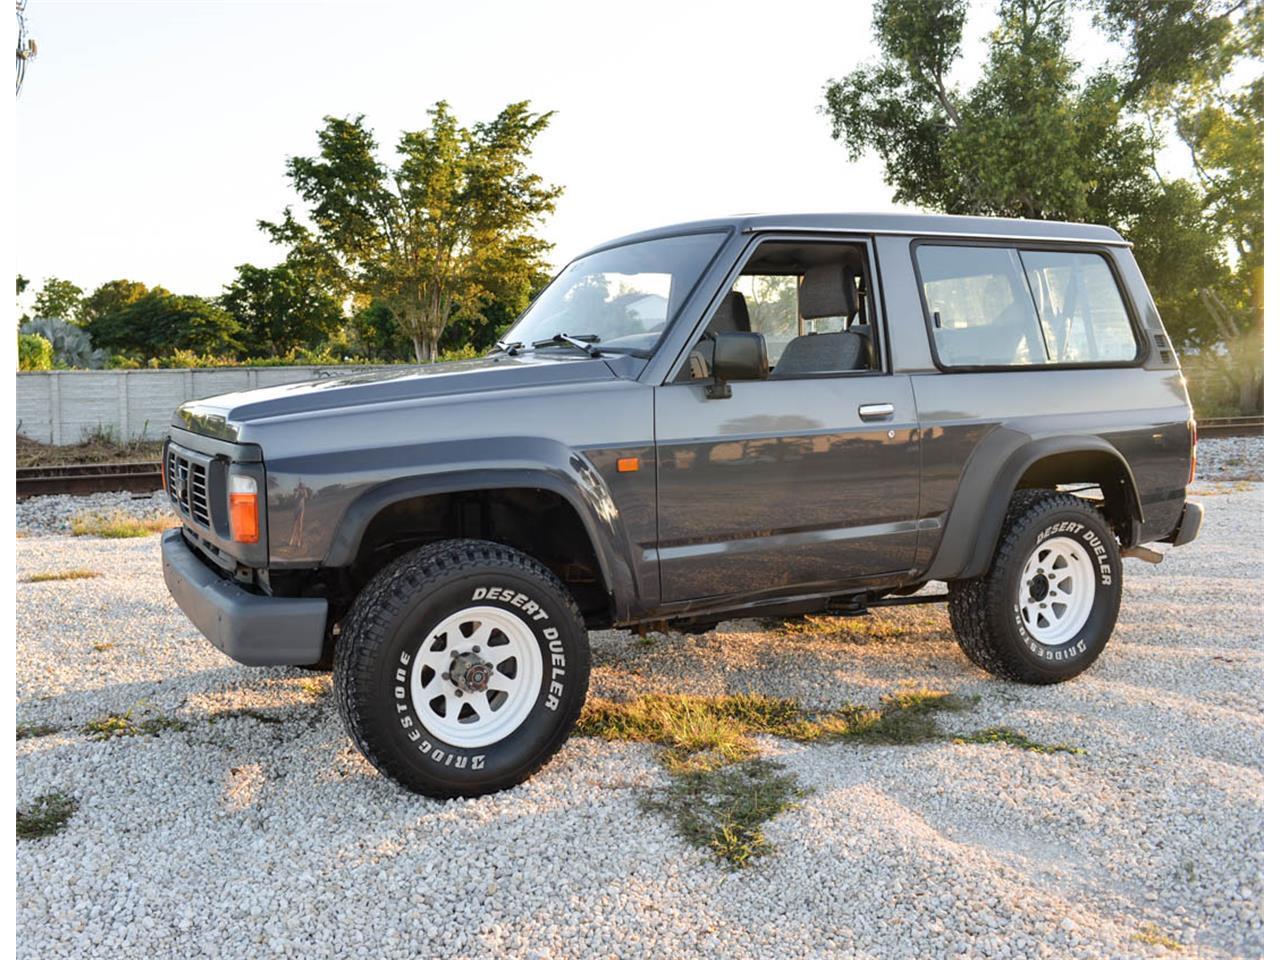 1990 Nissan Patrol For Sale Classiccars Com Cc 1222702